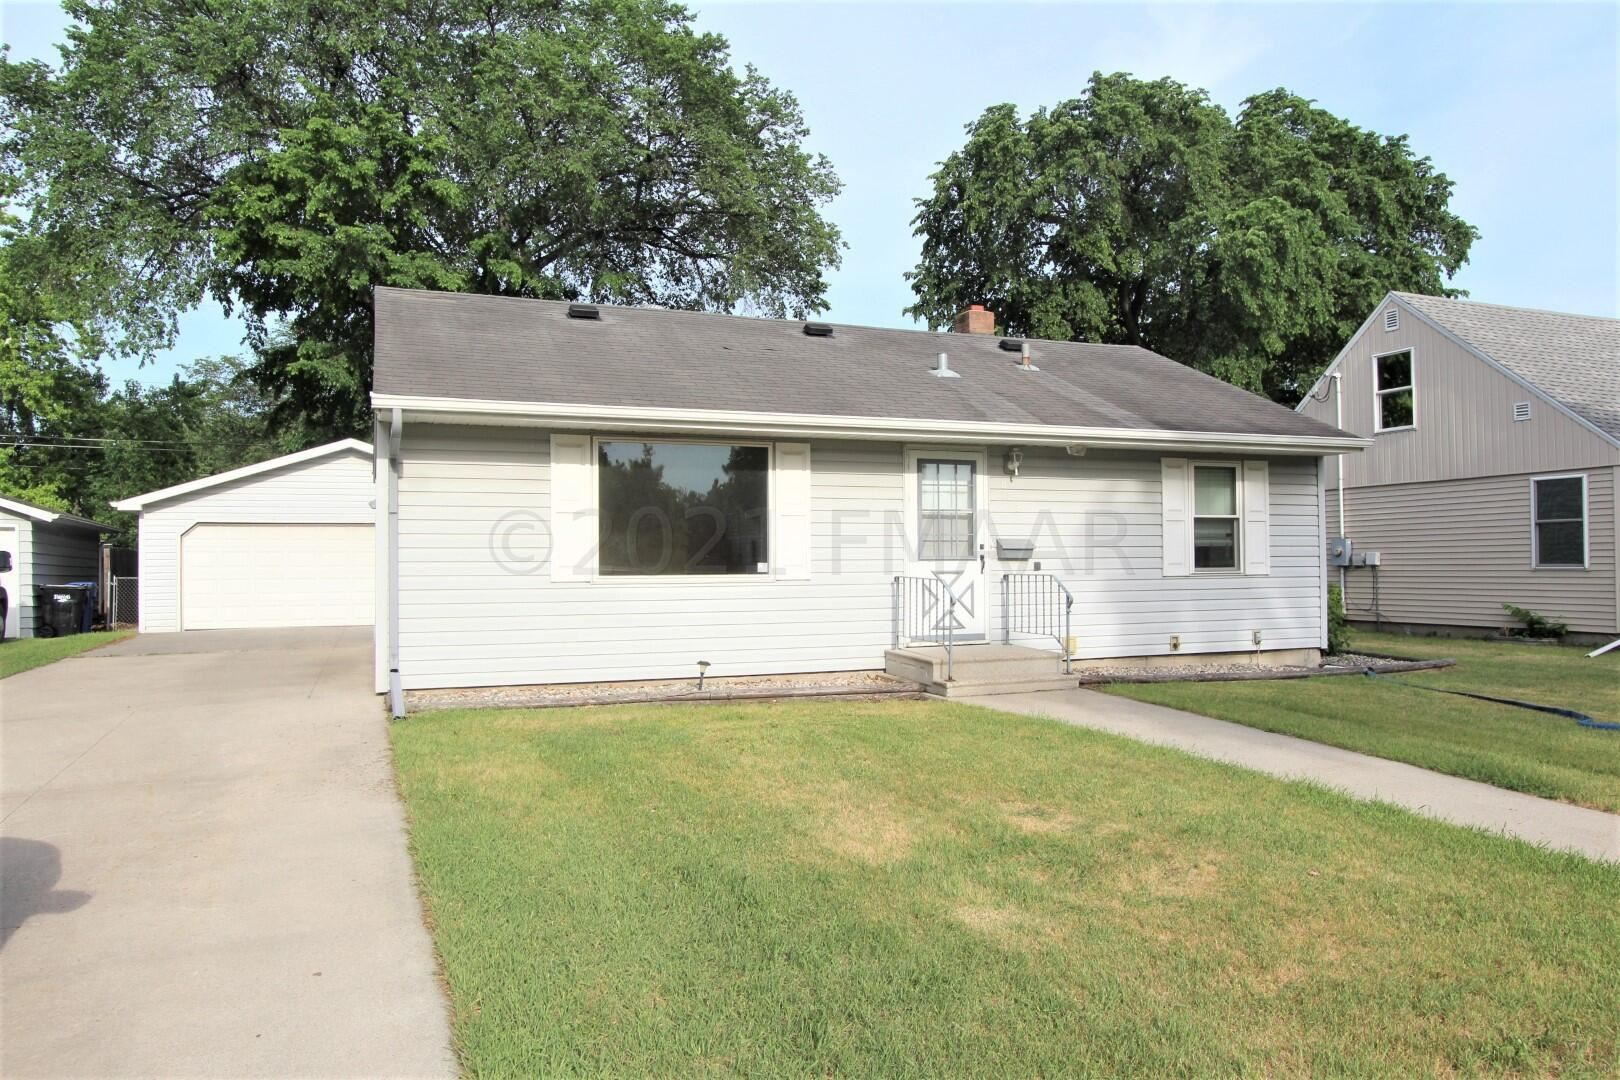 822 18 Street S, Fargo, ND 58103 - #: 21-5033